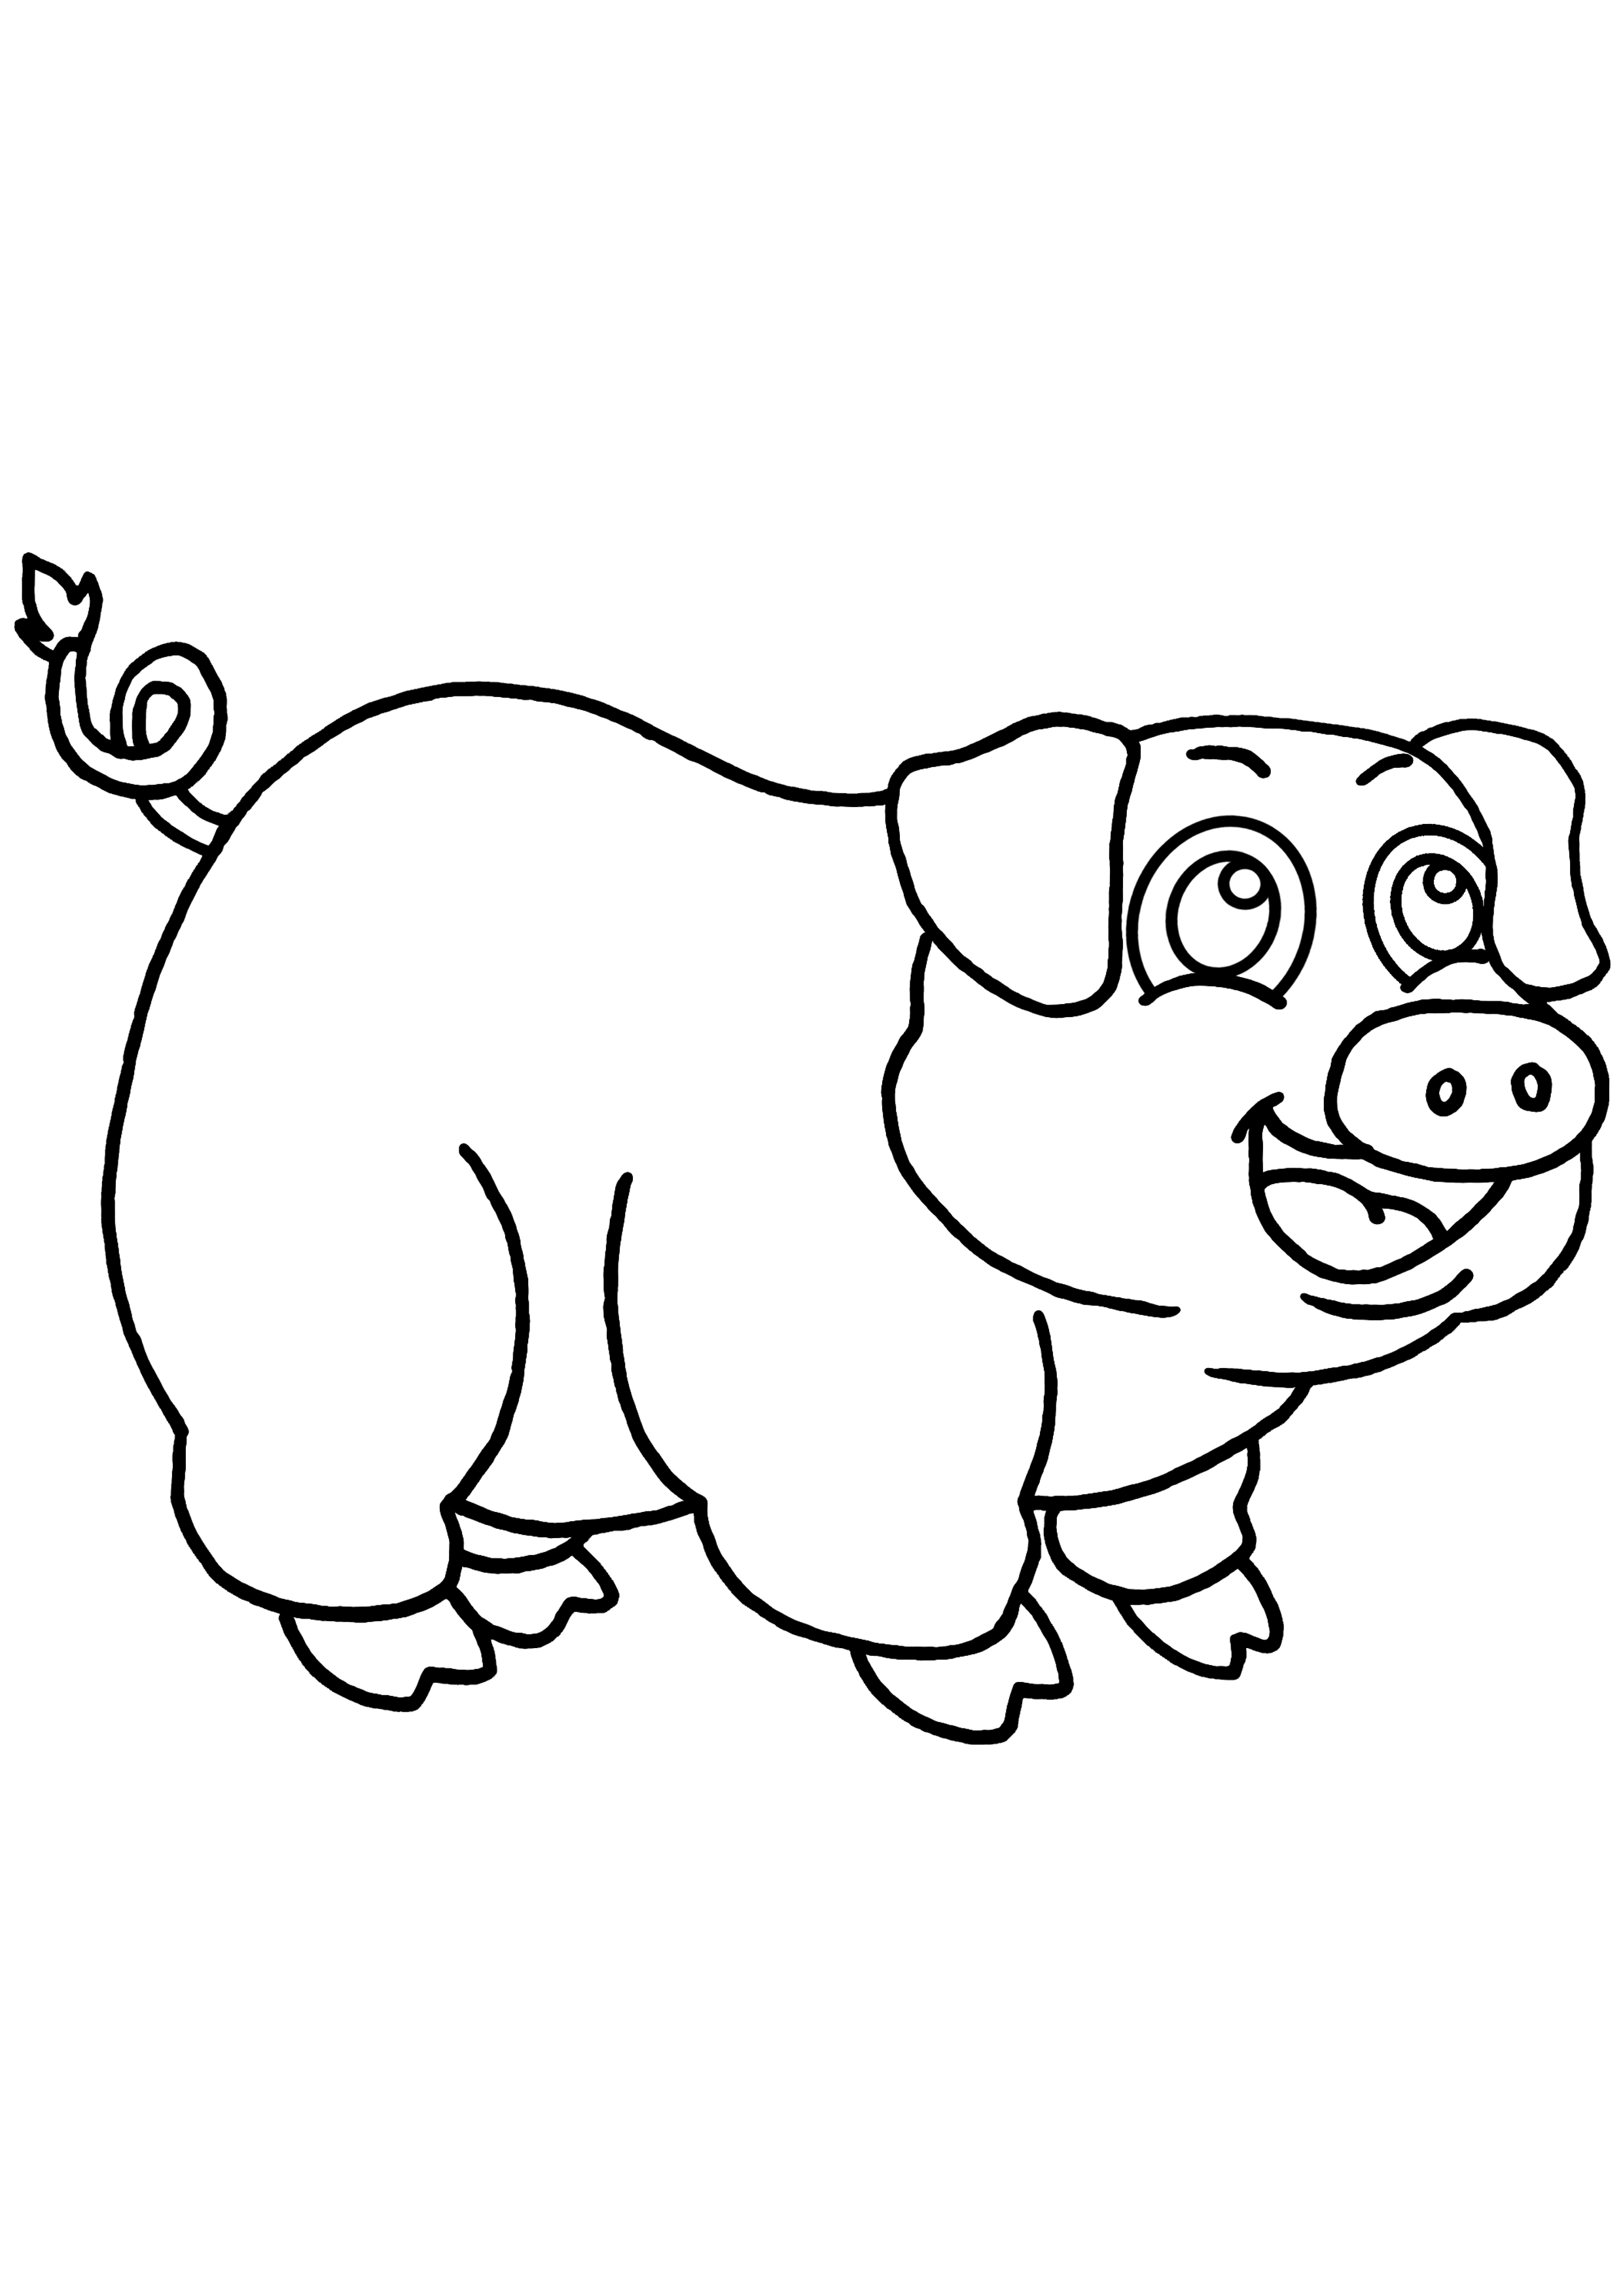 Coloriage dessiner cochon d 39 inde imprimer - Dessin d un cochon ...